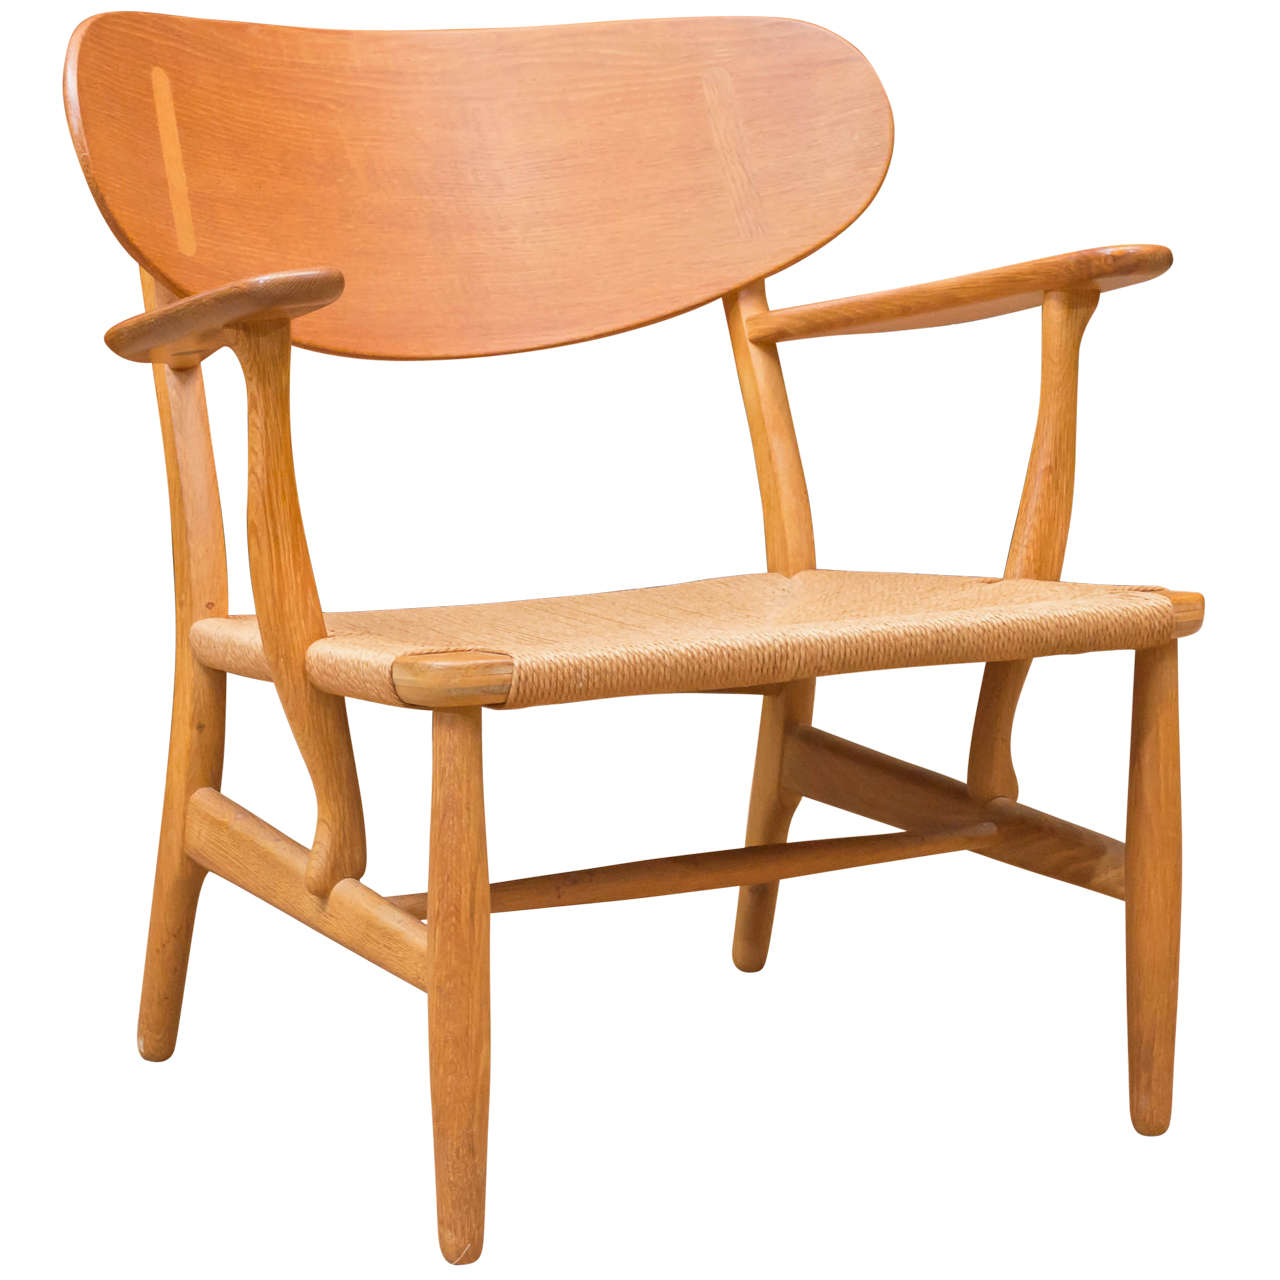 hans j wegner ch 22 chair at 1stdibs. Black Bedroom Furniture Sets. Home Design Ideas